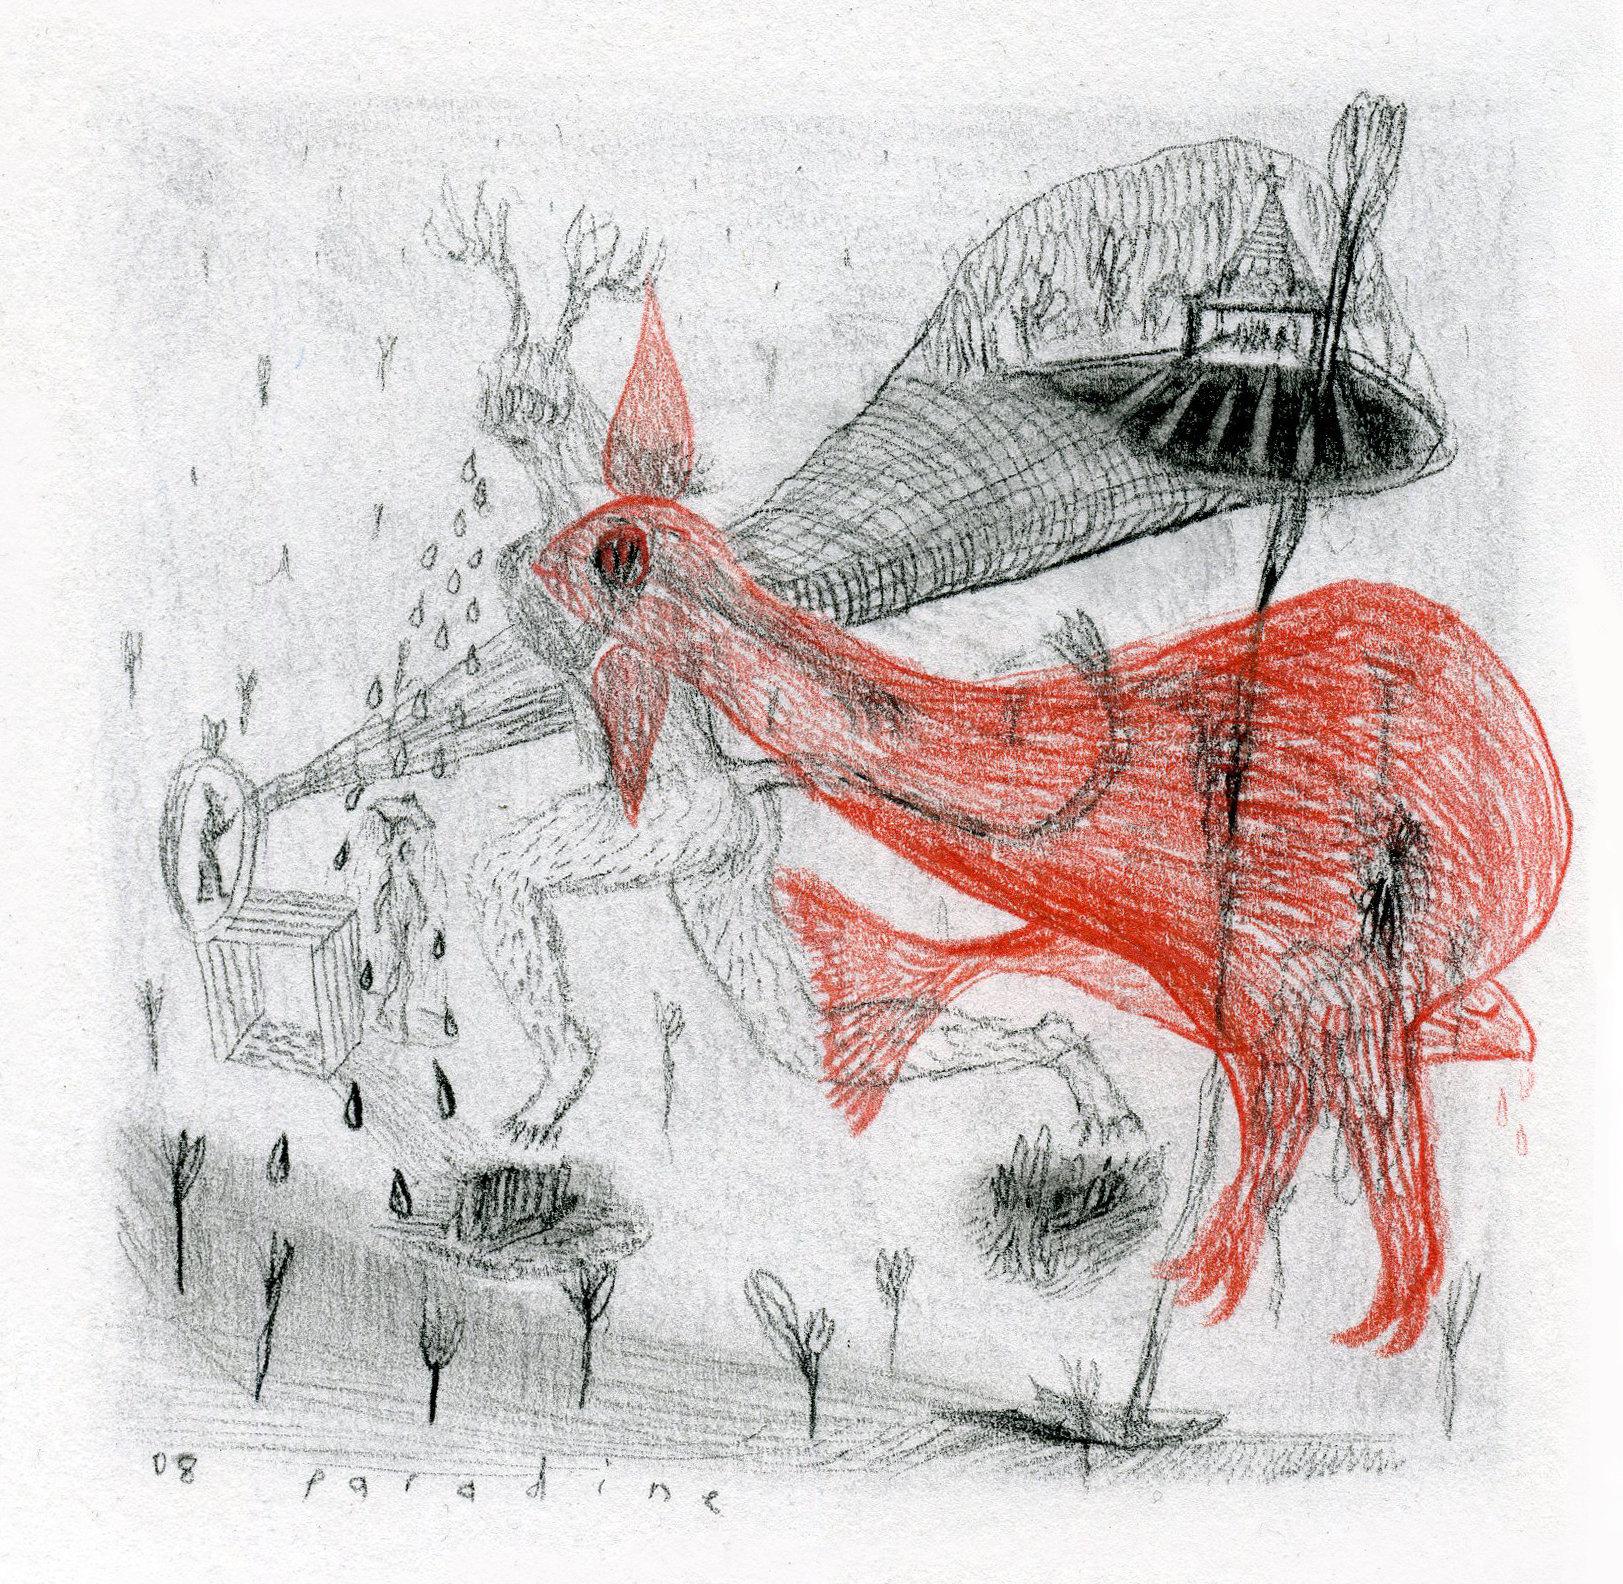 14. 'Untitled' Conte, & coloured pastel pencil on paper 15x15cm 2008